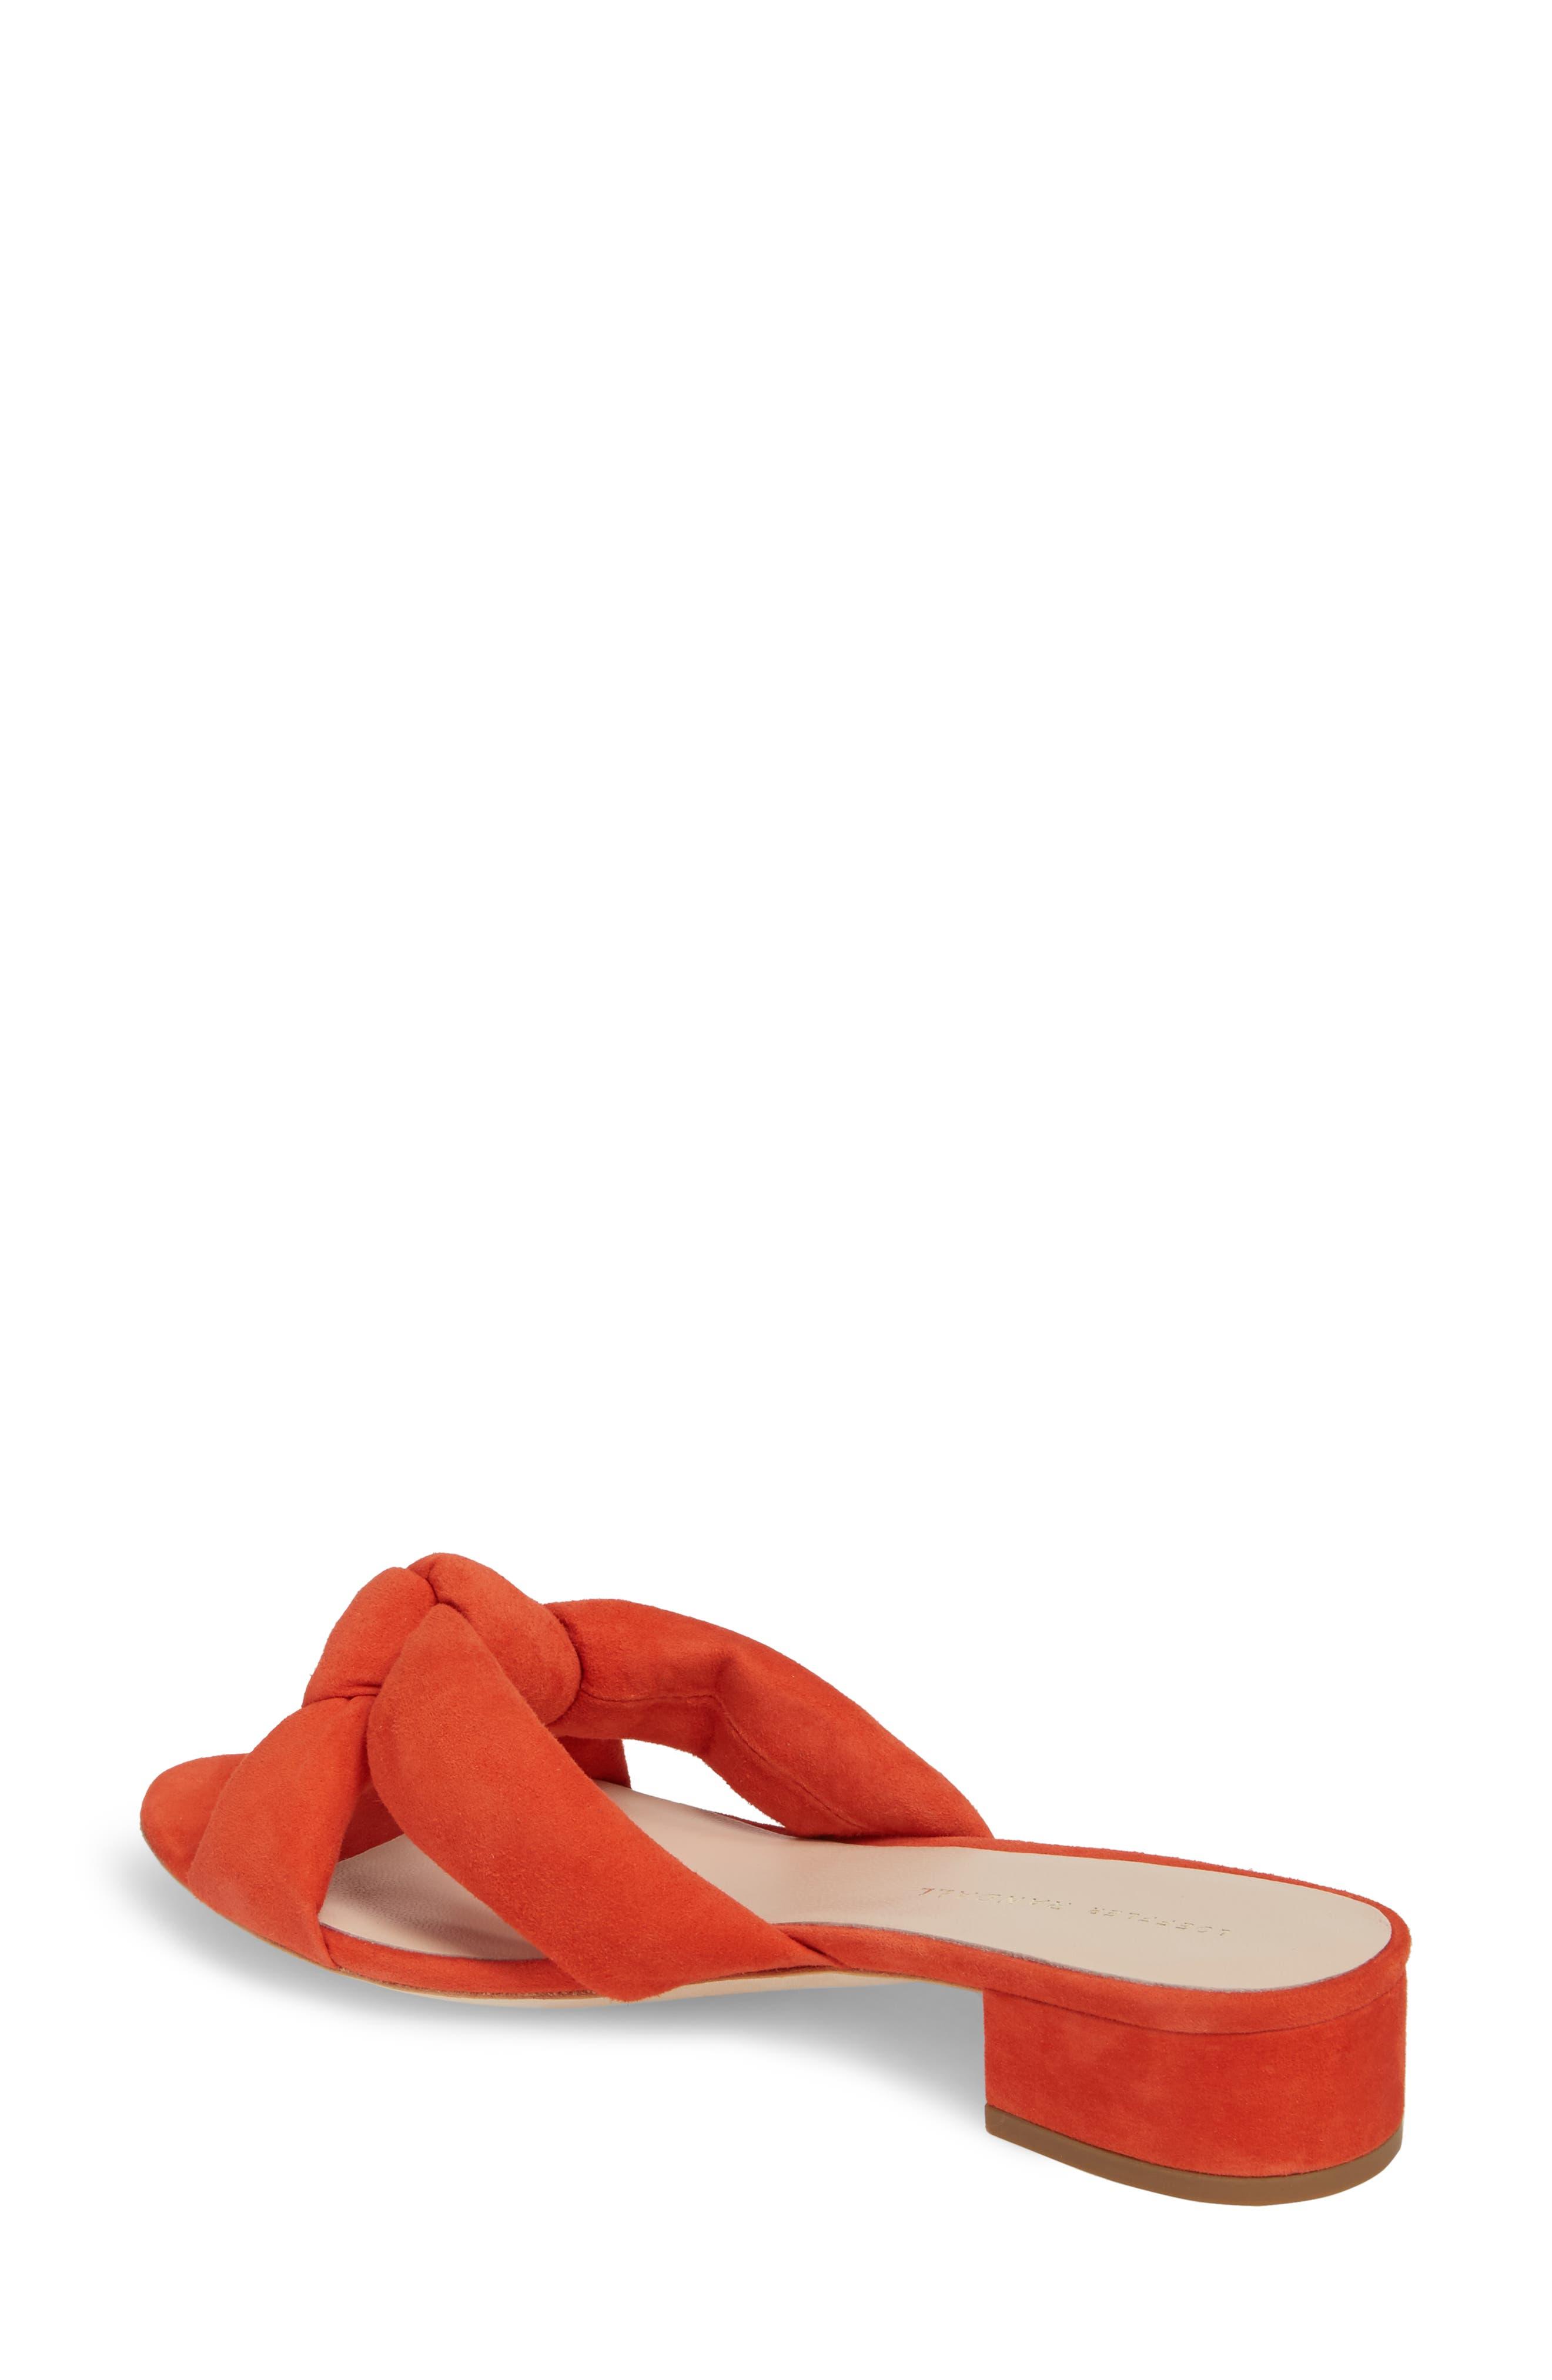 Elsie Knotted Slide Sandal,                             Alternate thumbnail 2, color,                             Persimmon